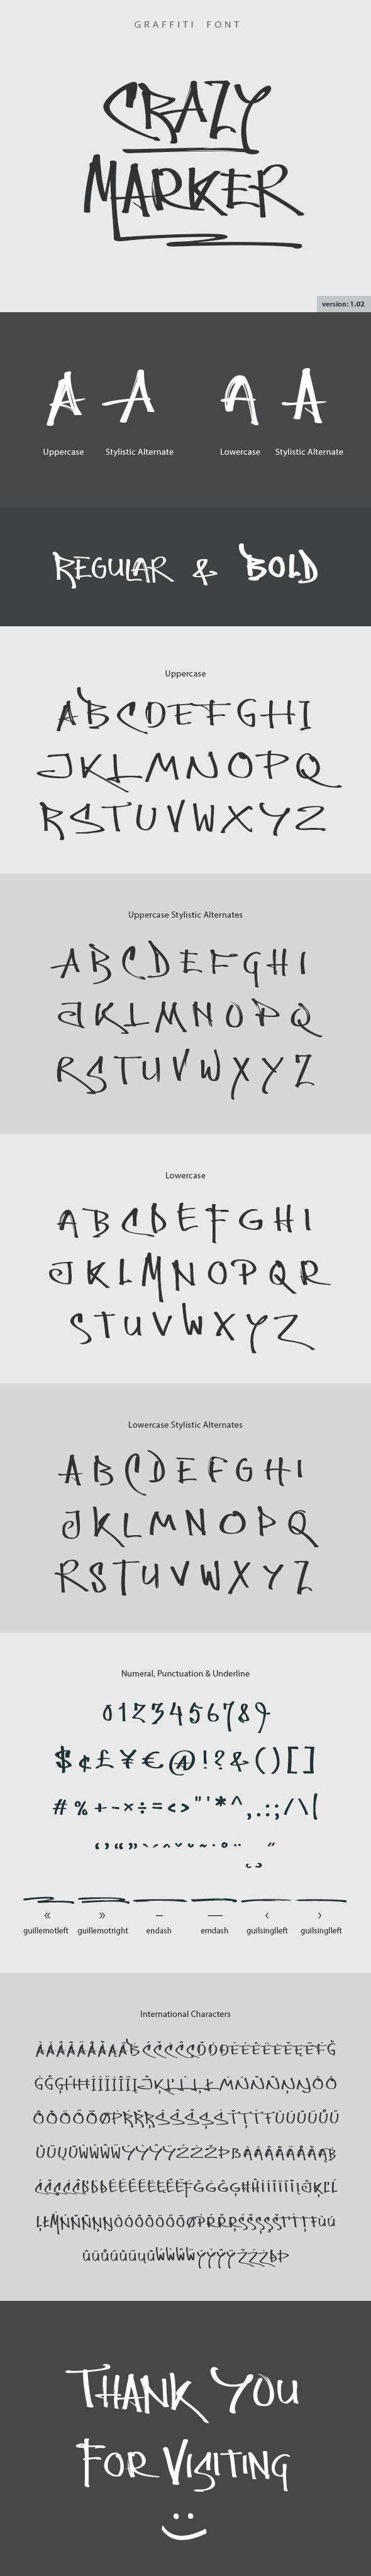 Crazy Marker Graffiti Font — TrueType TTF #font #script • Available here → https://graphicriver.net/item/crazy-marker-graffiti-font/18984817?ref=pxcr